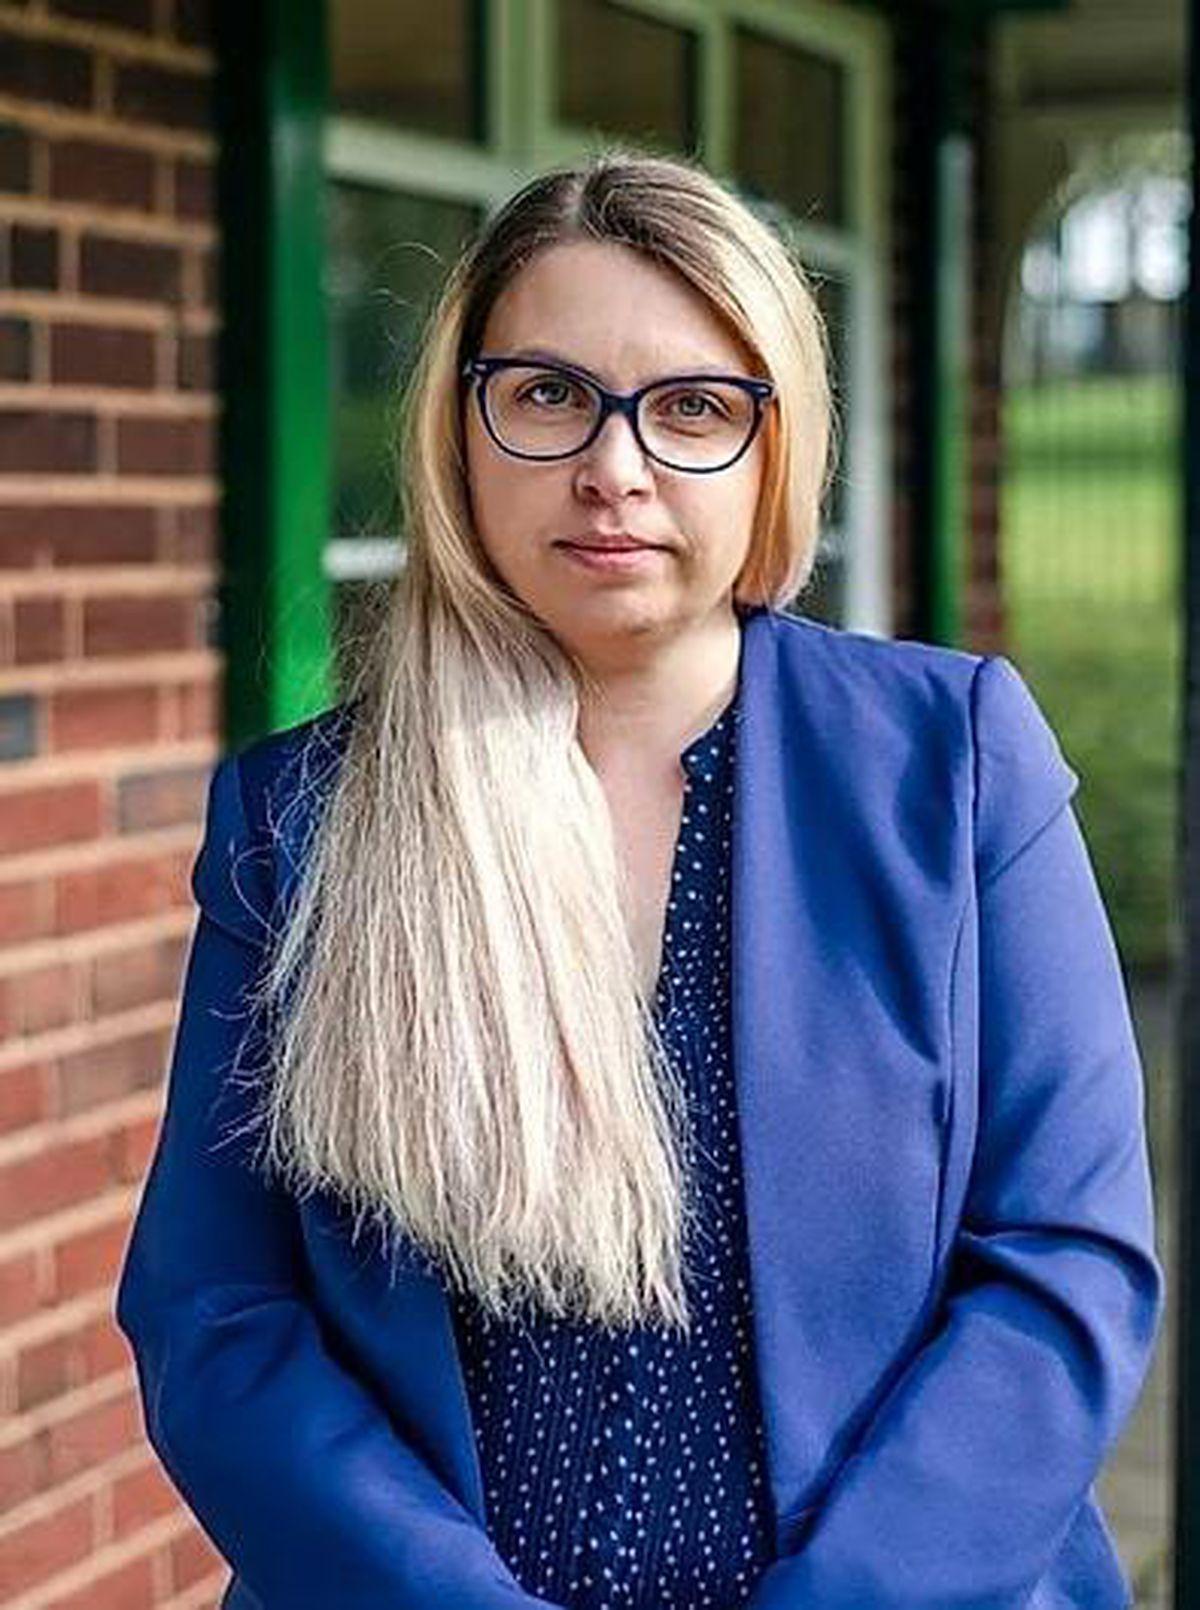 Irina Oshenye said the pandemic had shown U Island CIC could adapt to any circumstance